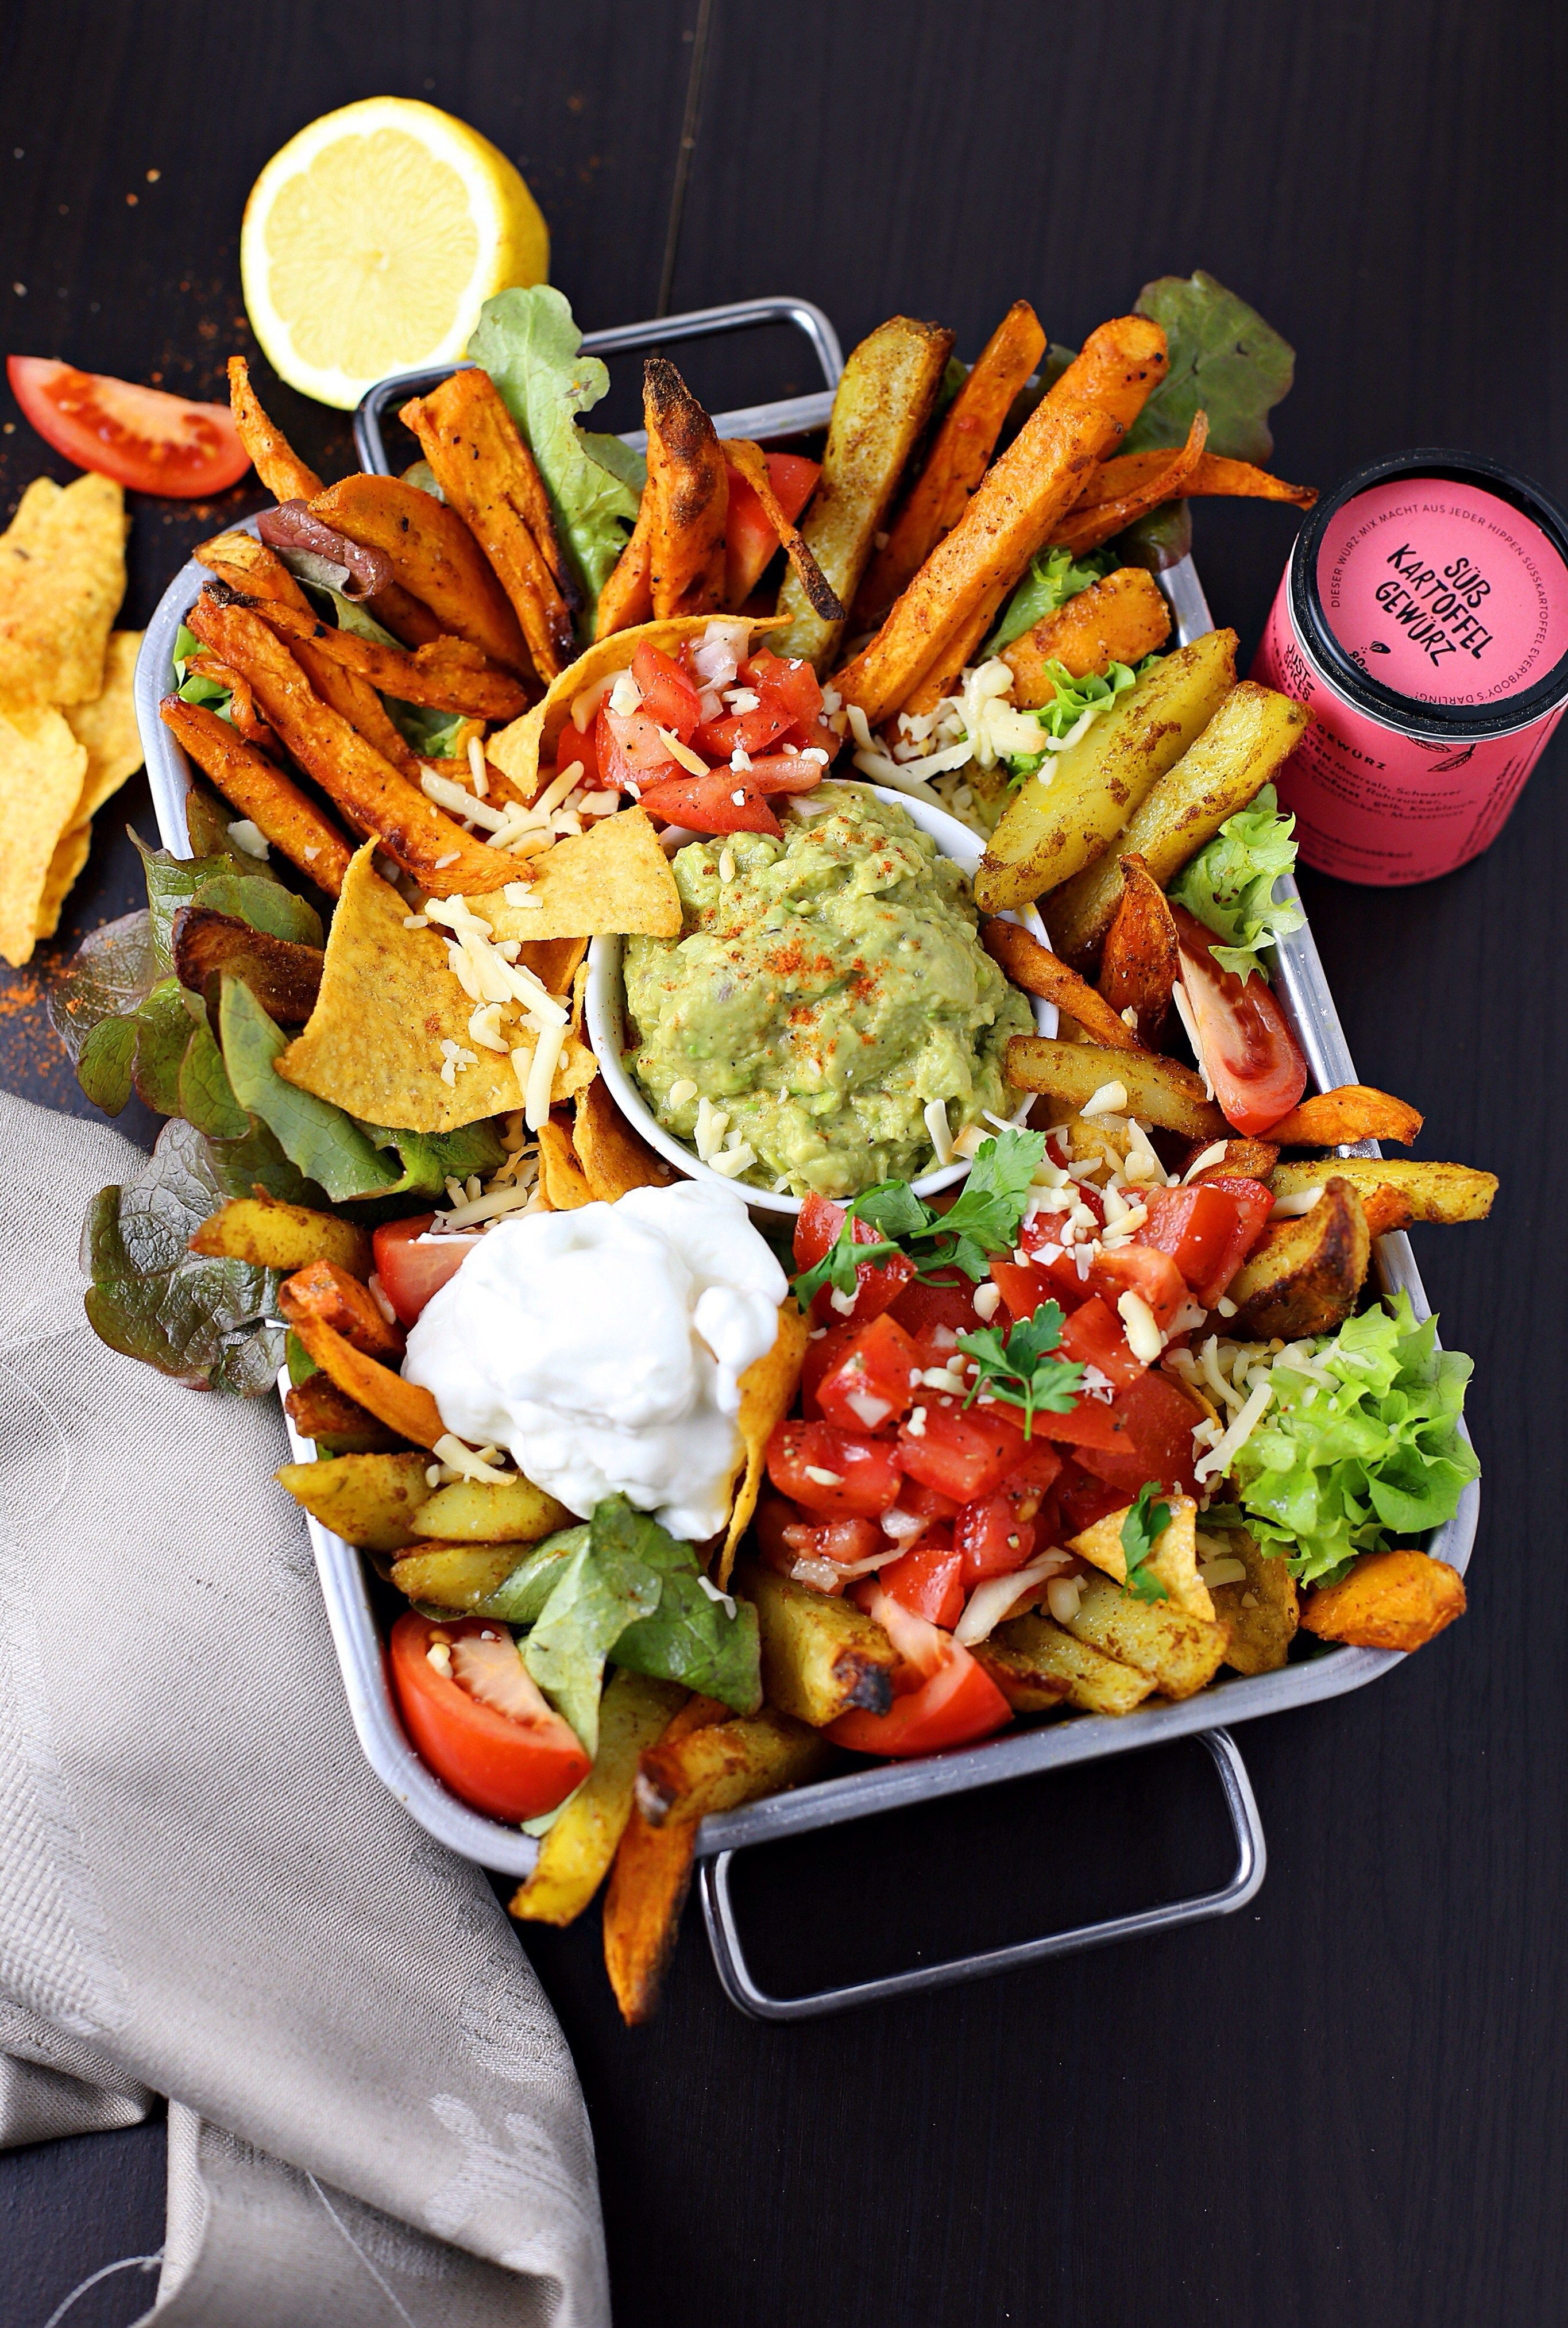 Party Bowl for 2 | Lebensmittel essen, Abendessen ideen